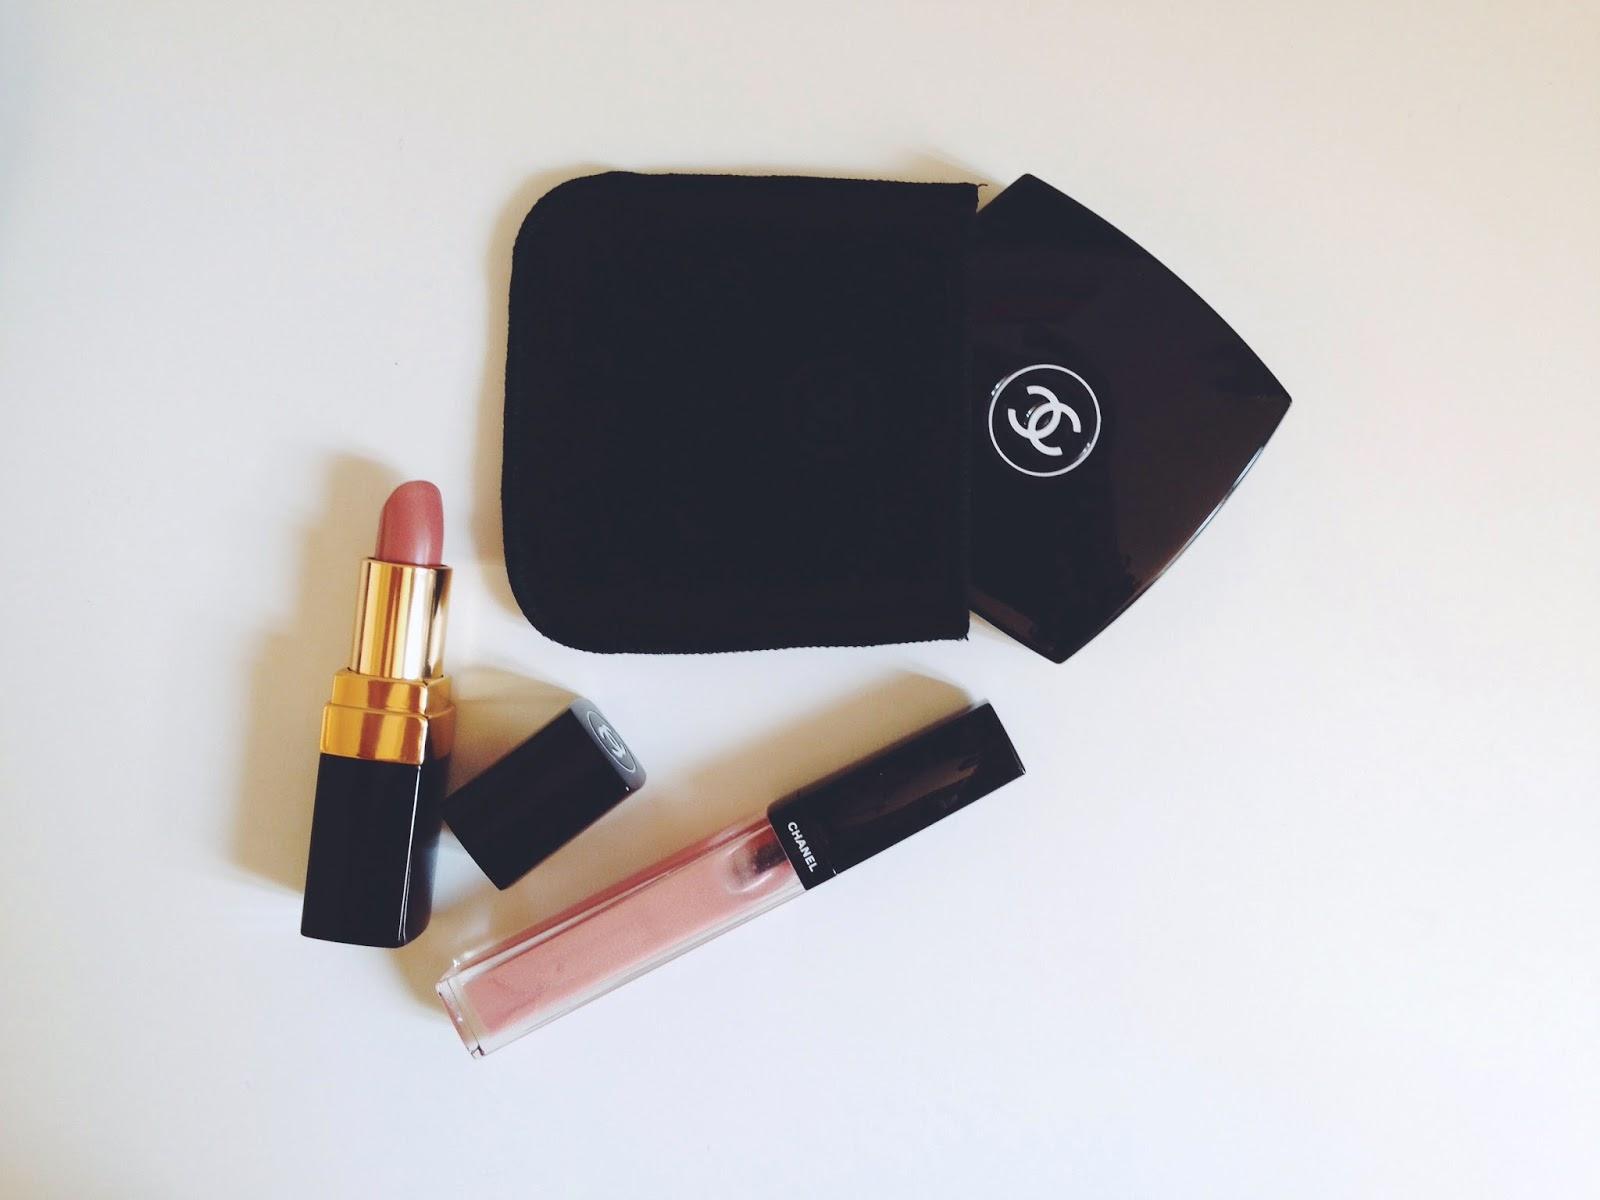 Chanel Makeup | Allegory of Vanity